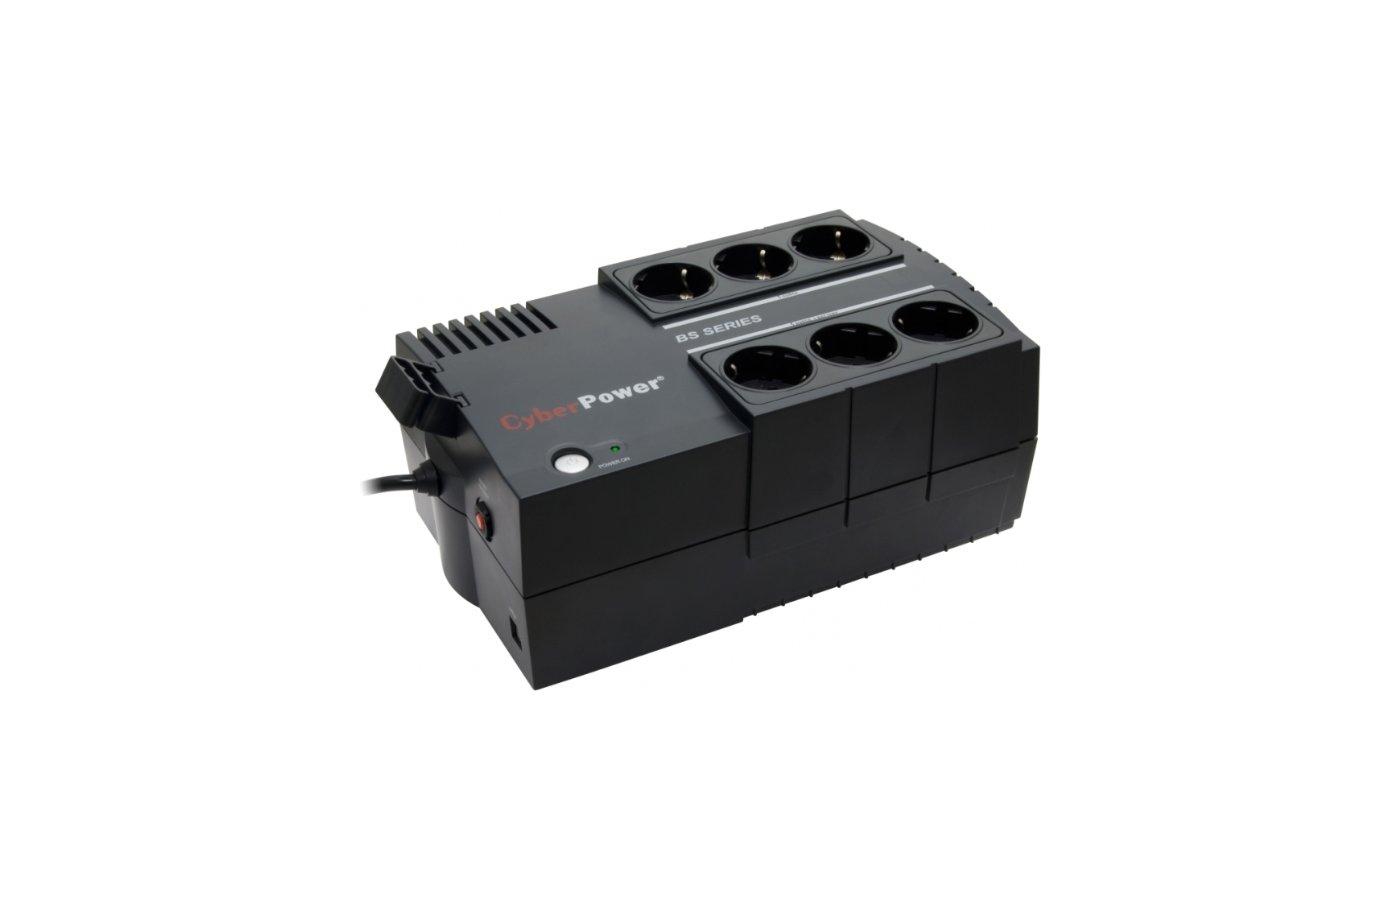 Блок питания CyberPower BS650E 650VA/360W (33 EURO)